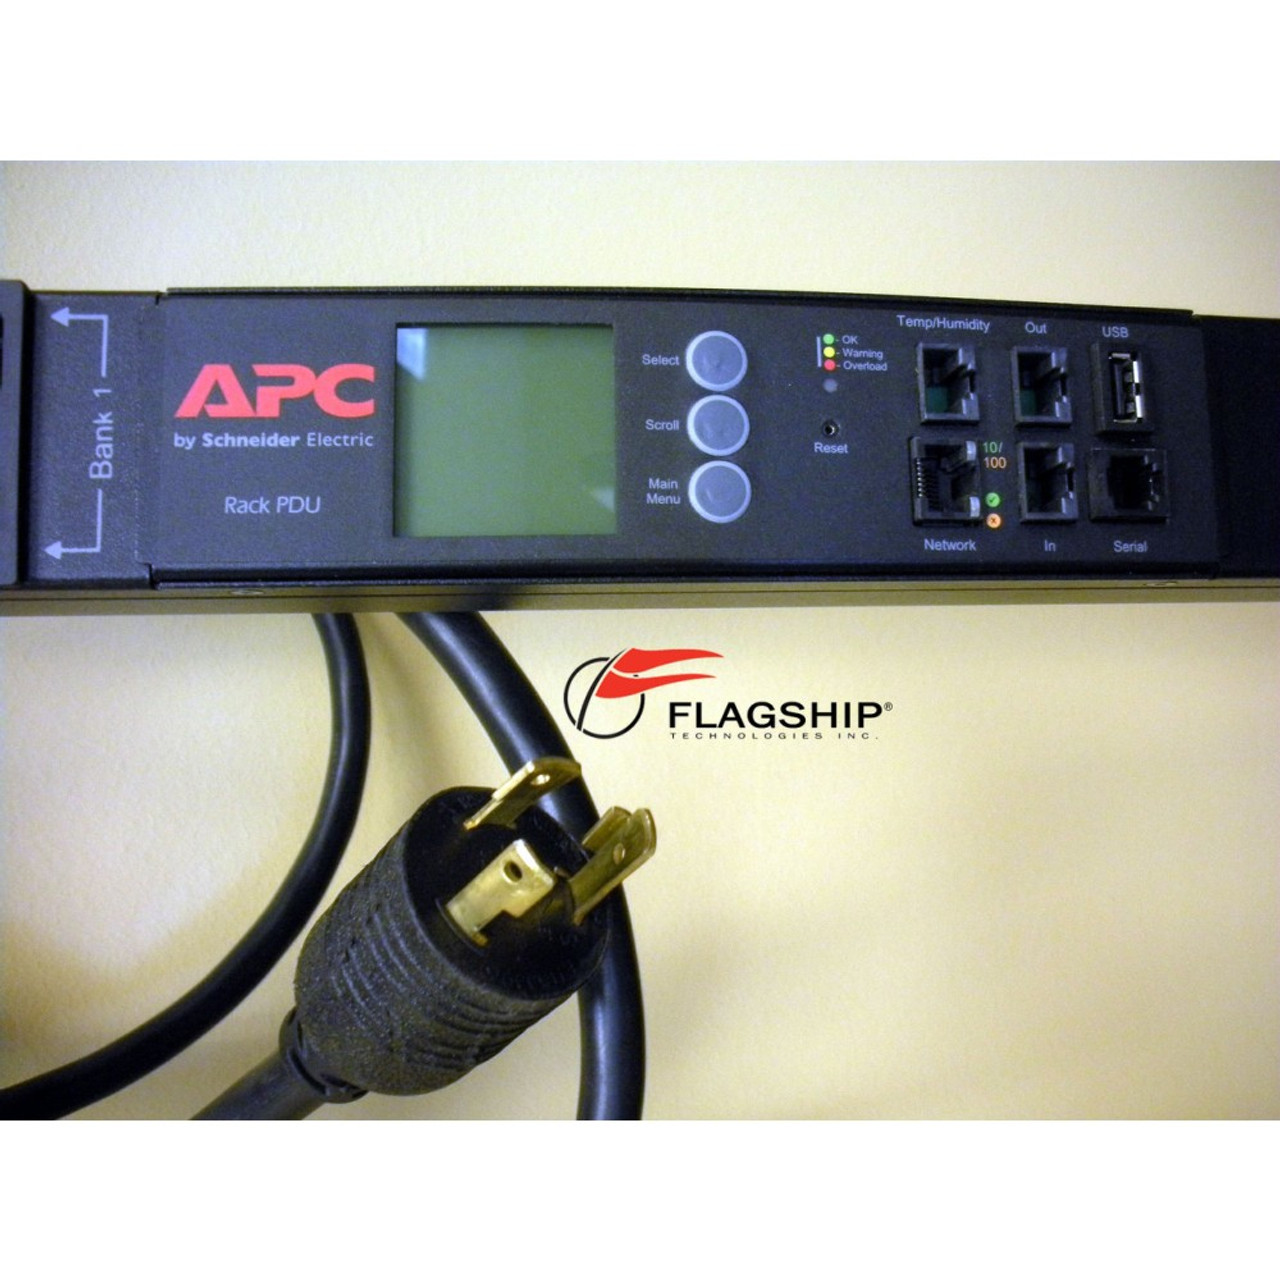 apc ap8841 rack pdu 2g metered zerou 30a 200 208v 36 c13 6 c19